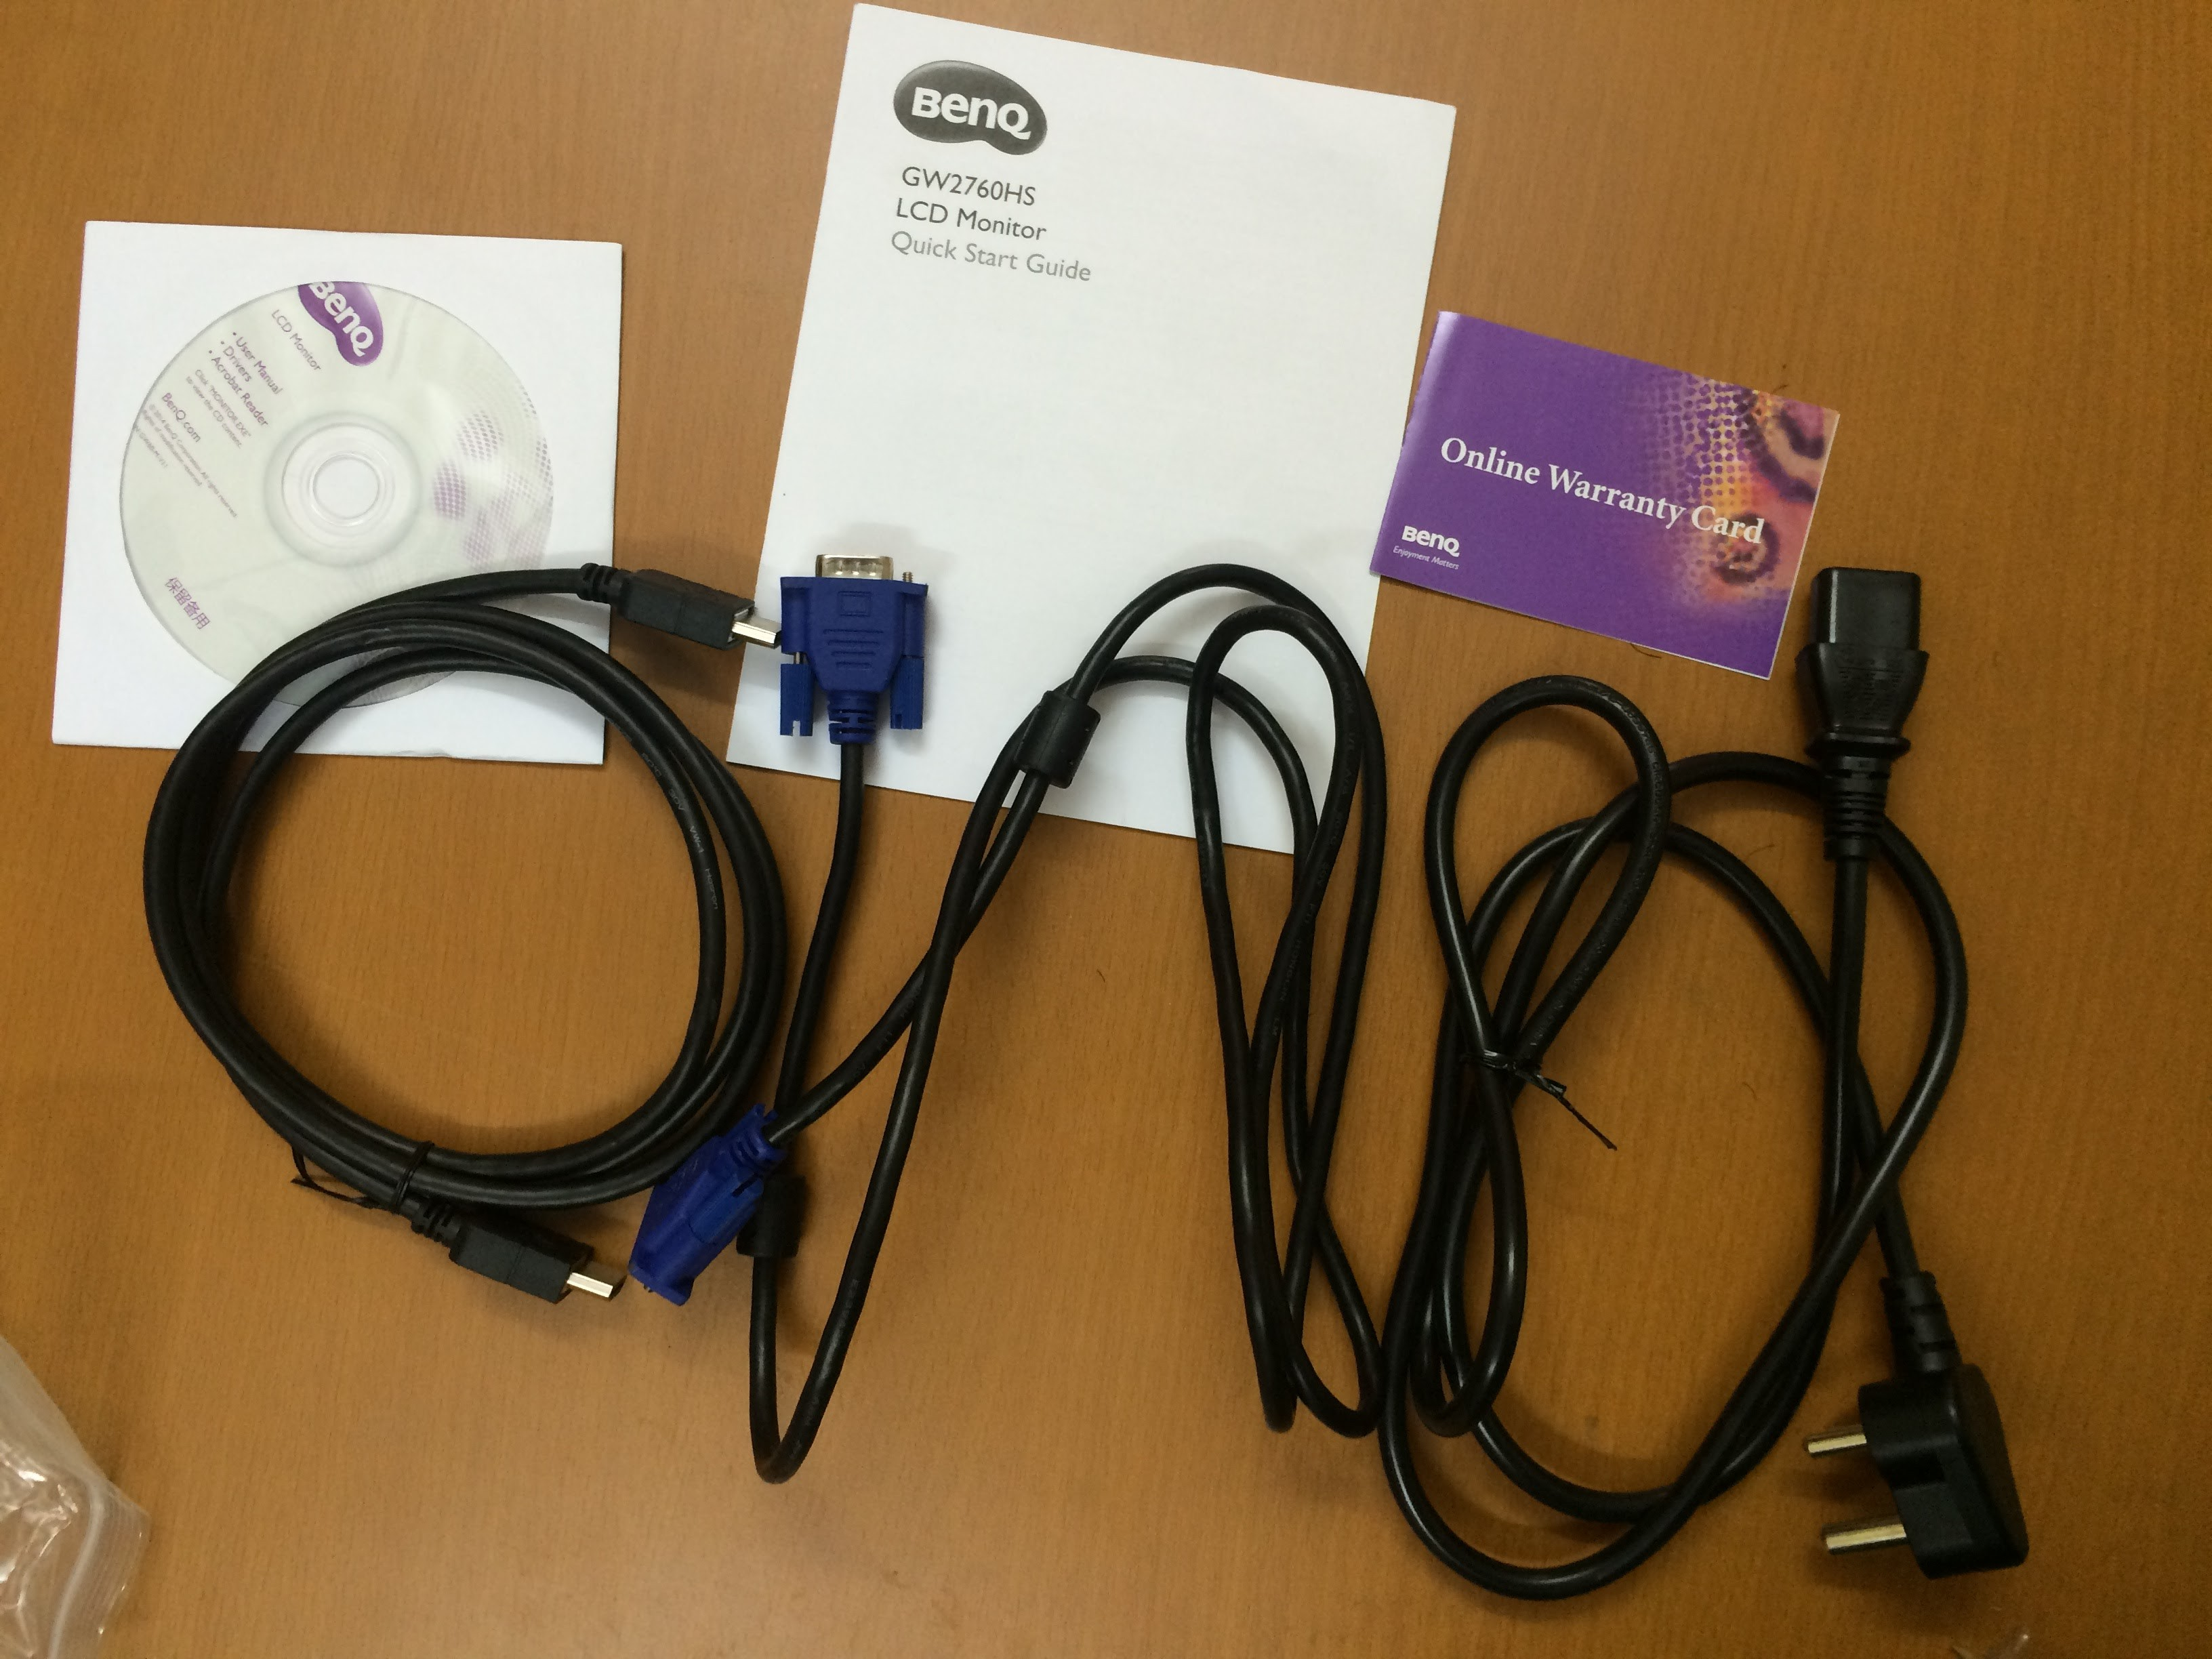 benq-gw2760hs-box-contents